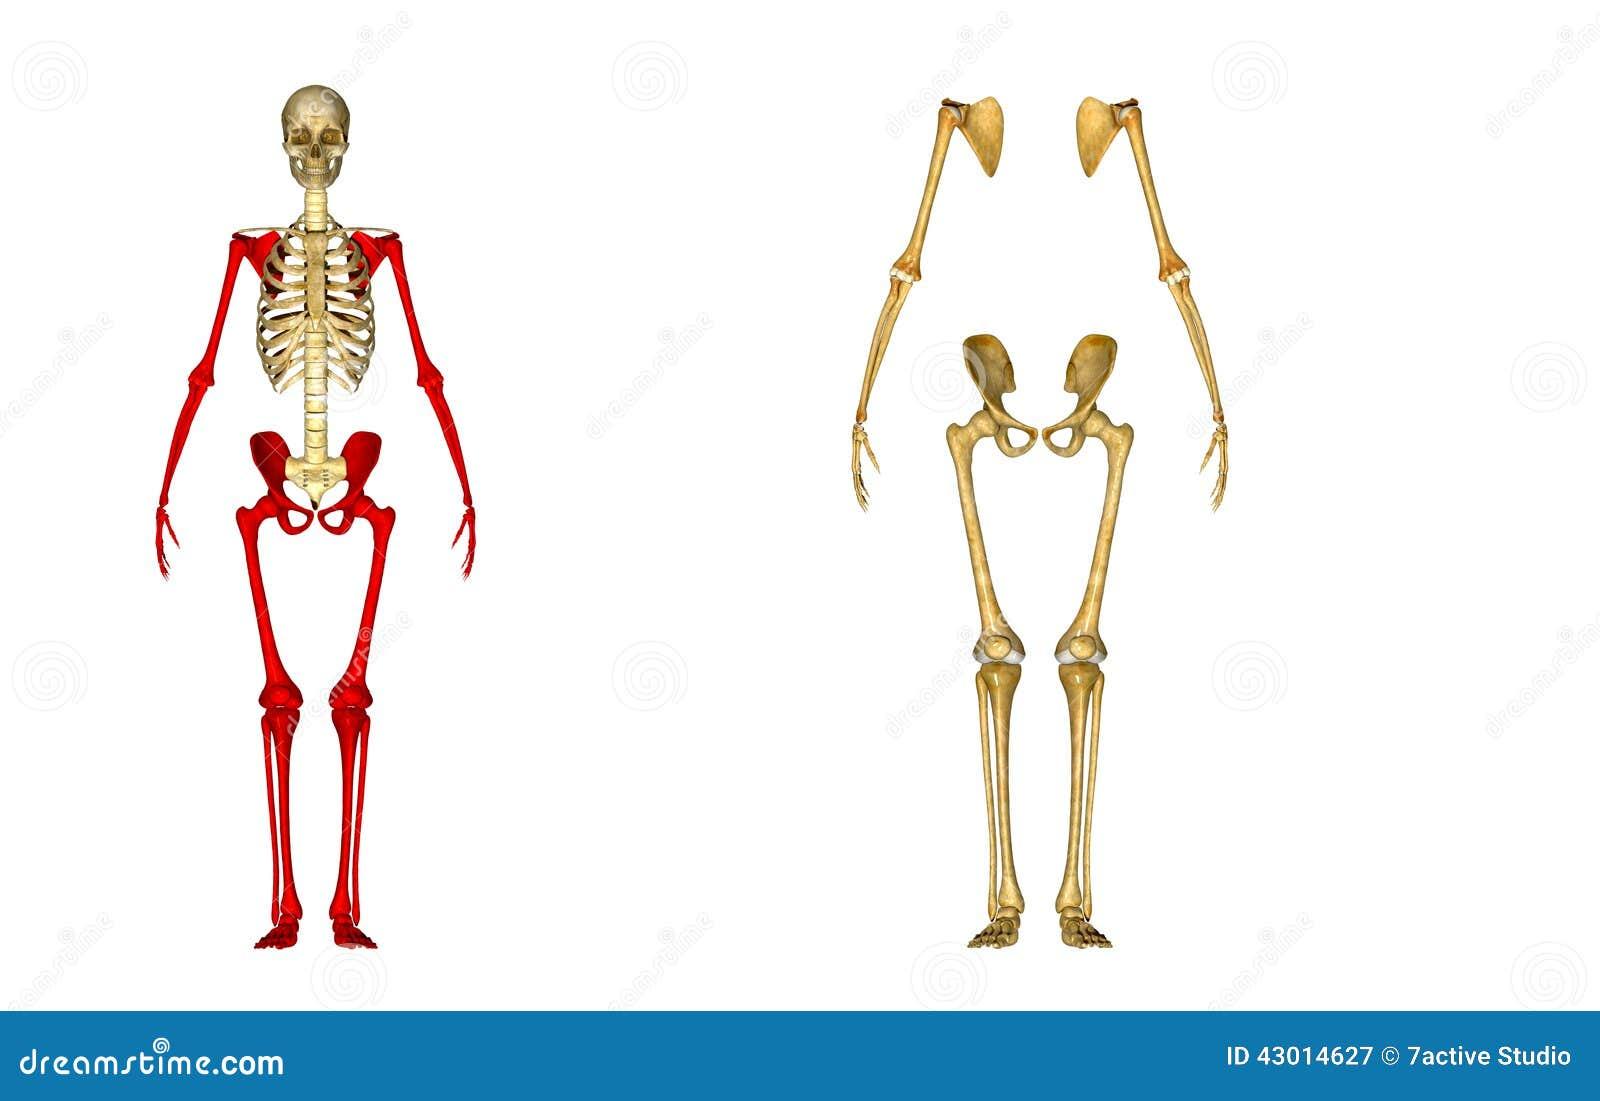 Esqueleto stock de ilustración. Ilustración de columna - 43014627